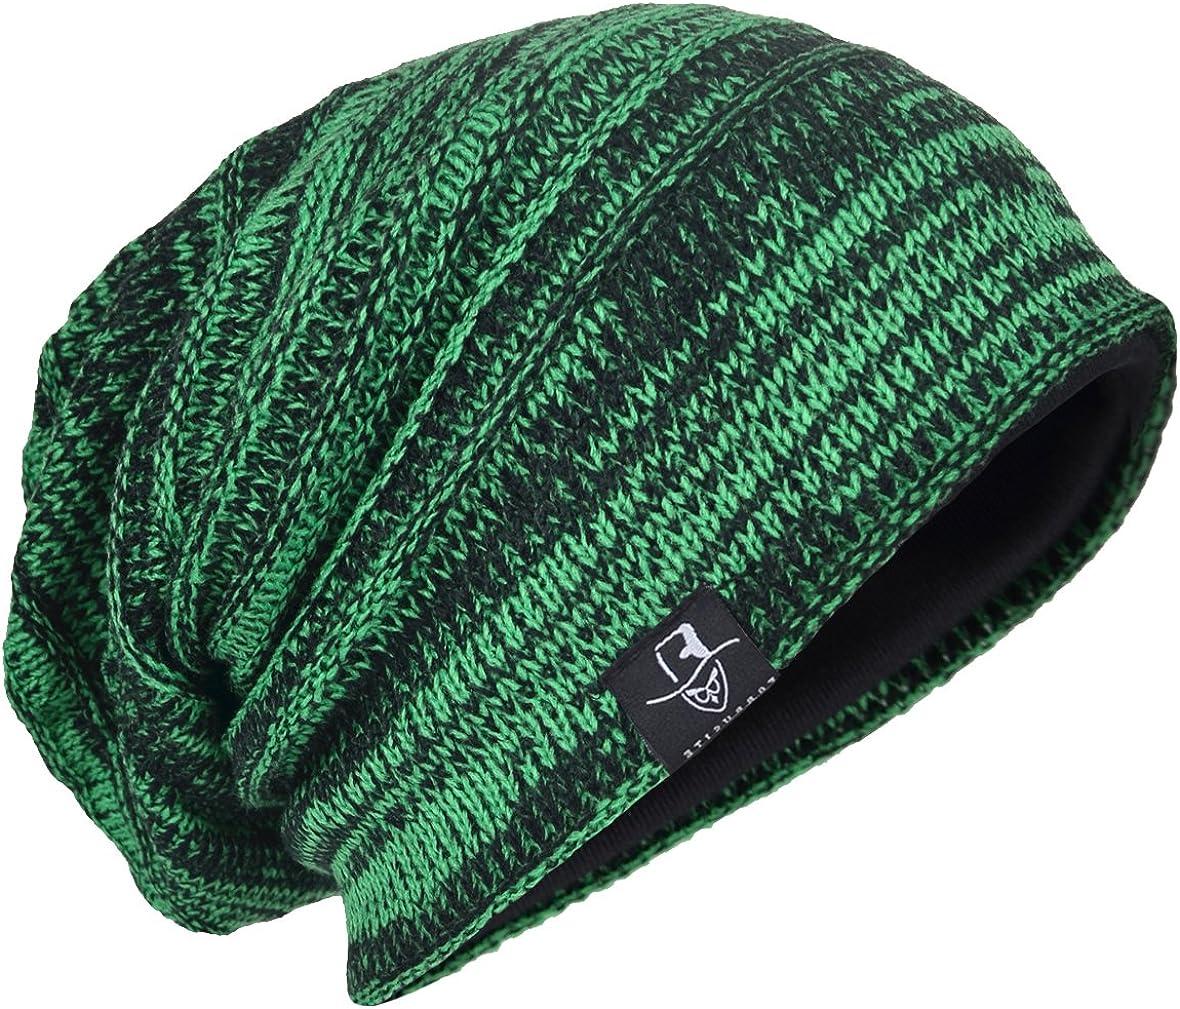 Men Oversize Skull Slouch Beanie Max 69% OFF 55% OFF Large Skullcap Hat Knit